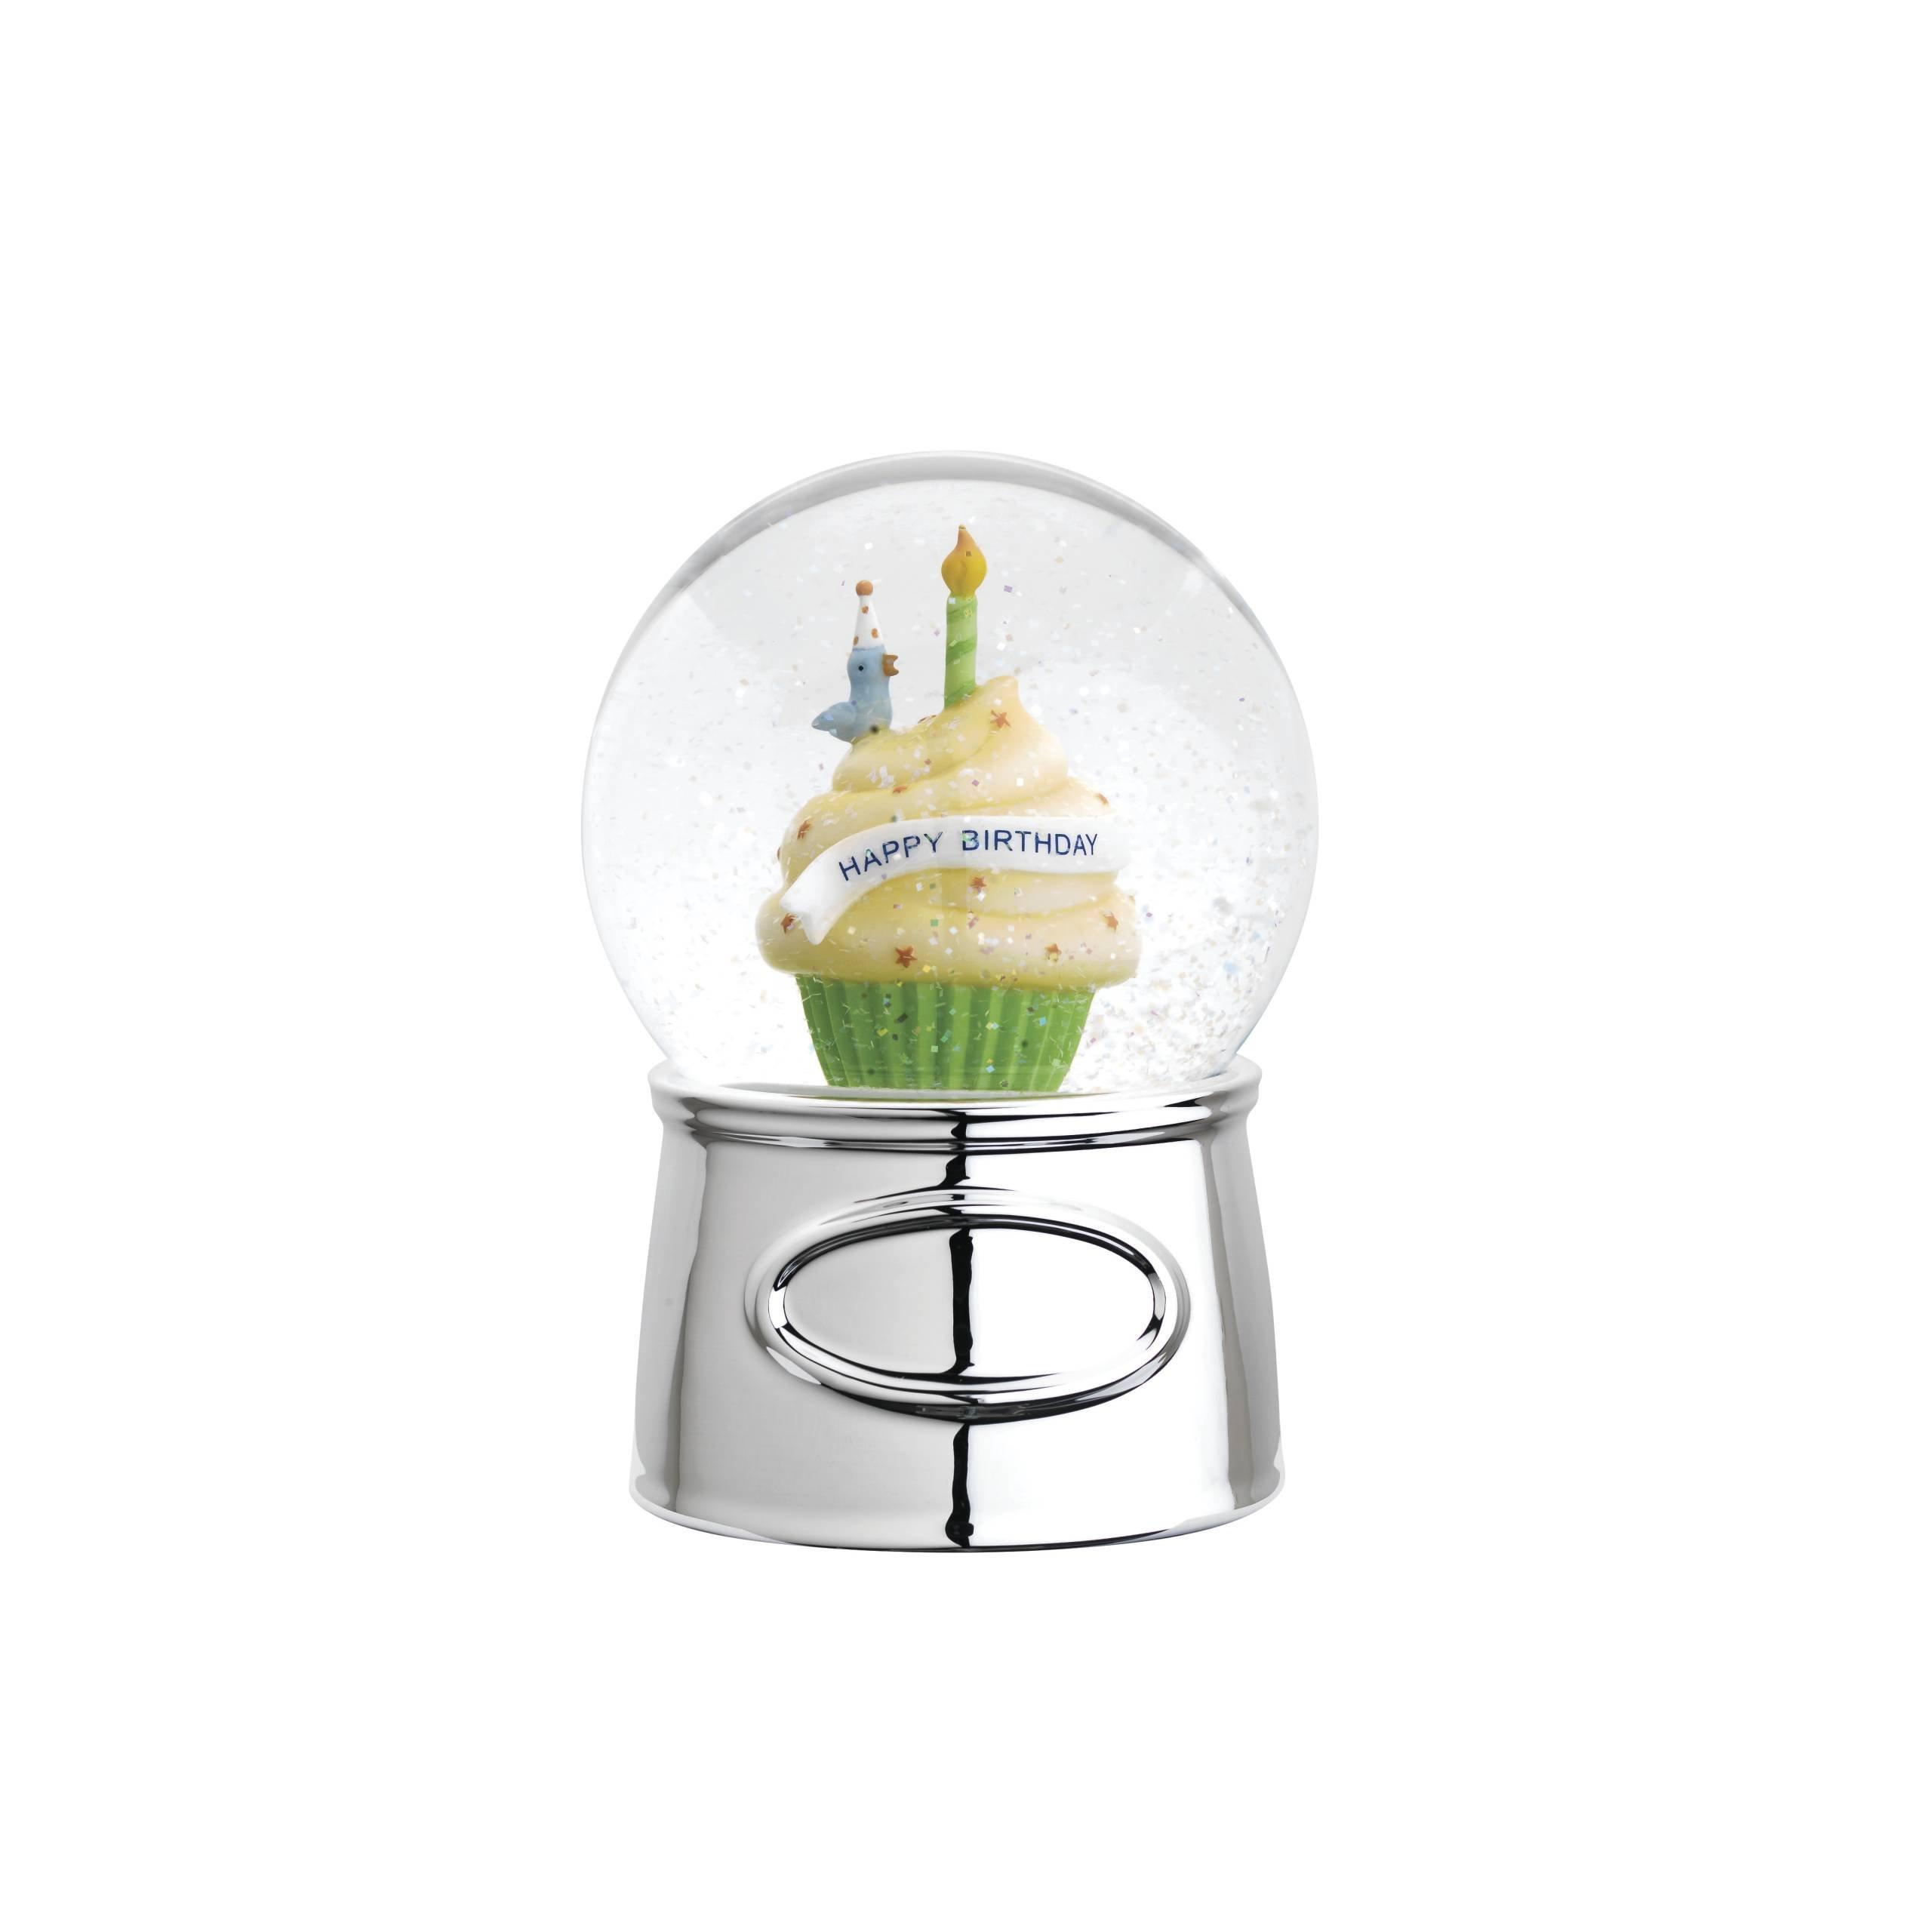 Reed & Barton 3221 Let's Celebrate Happy Birthday Waterglobe by Reed & Barton